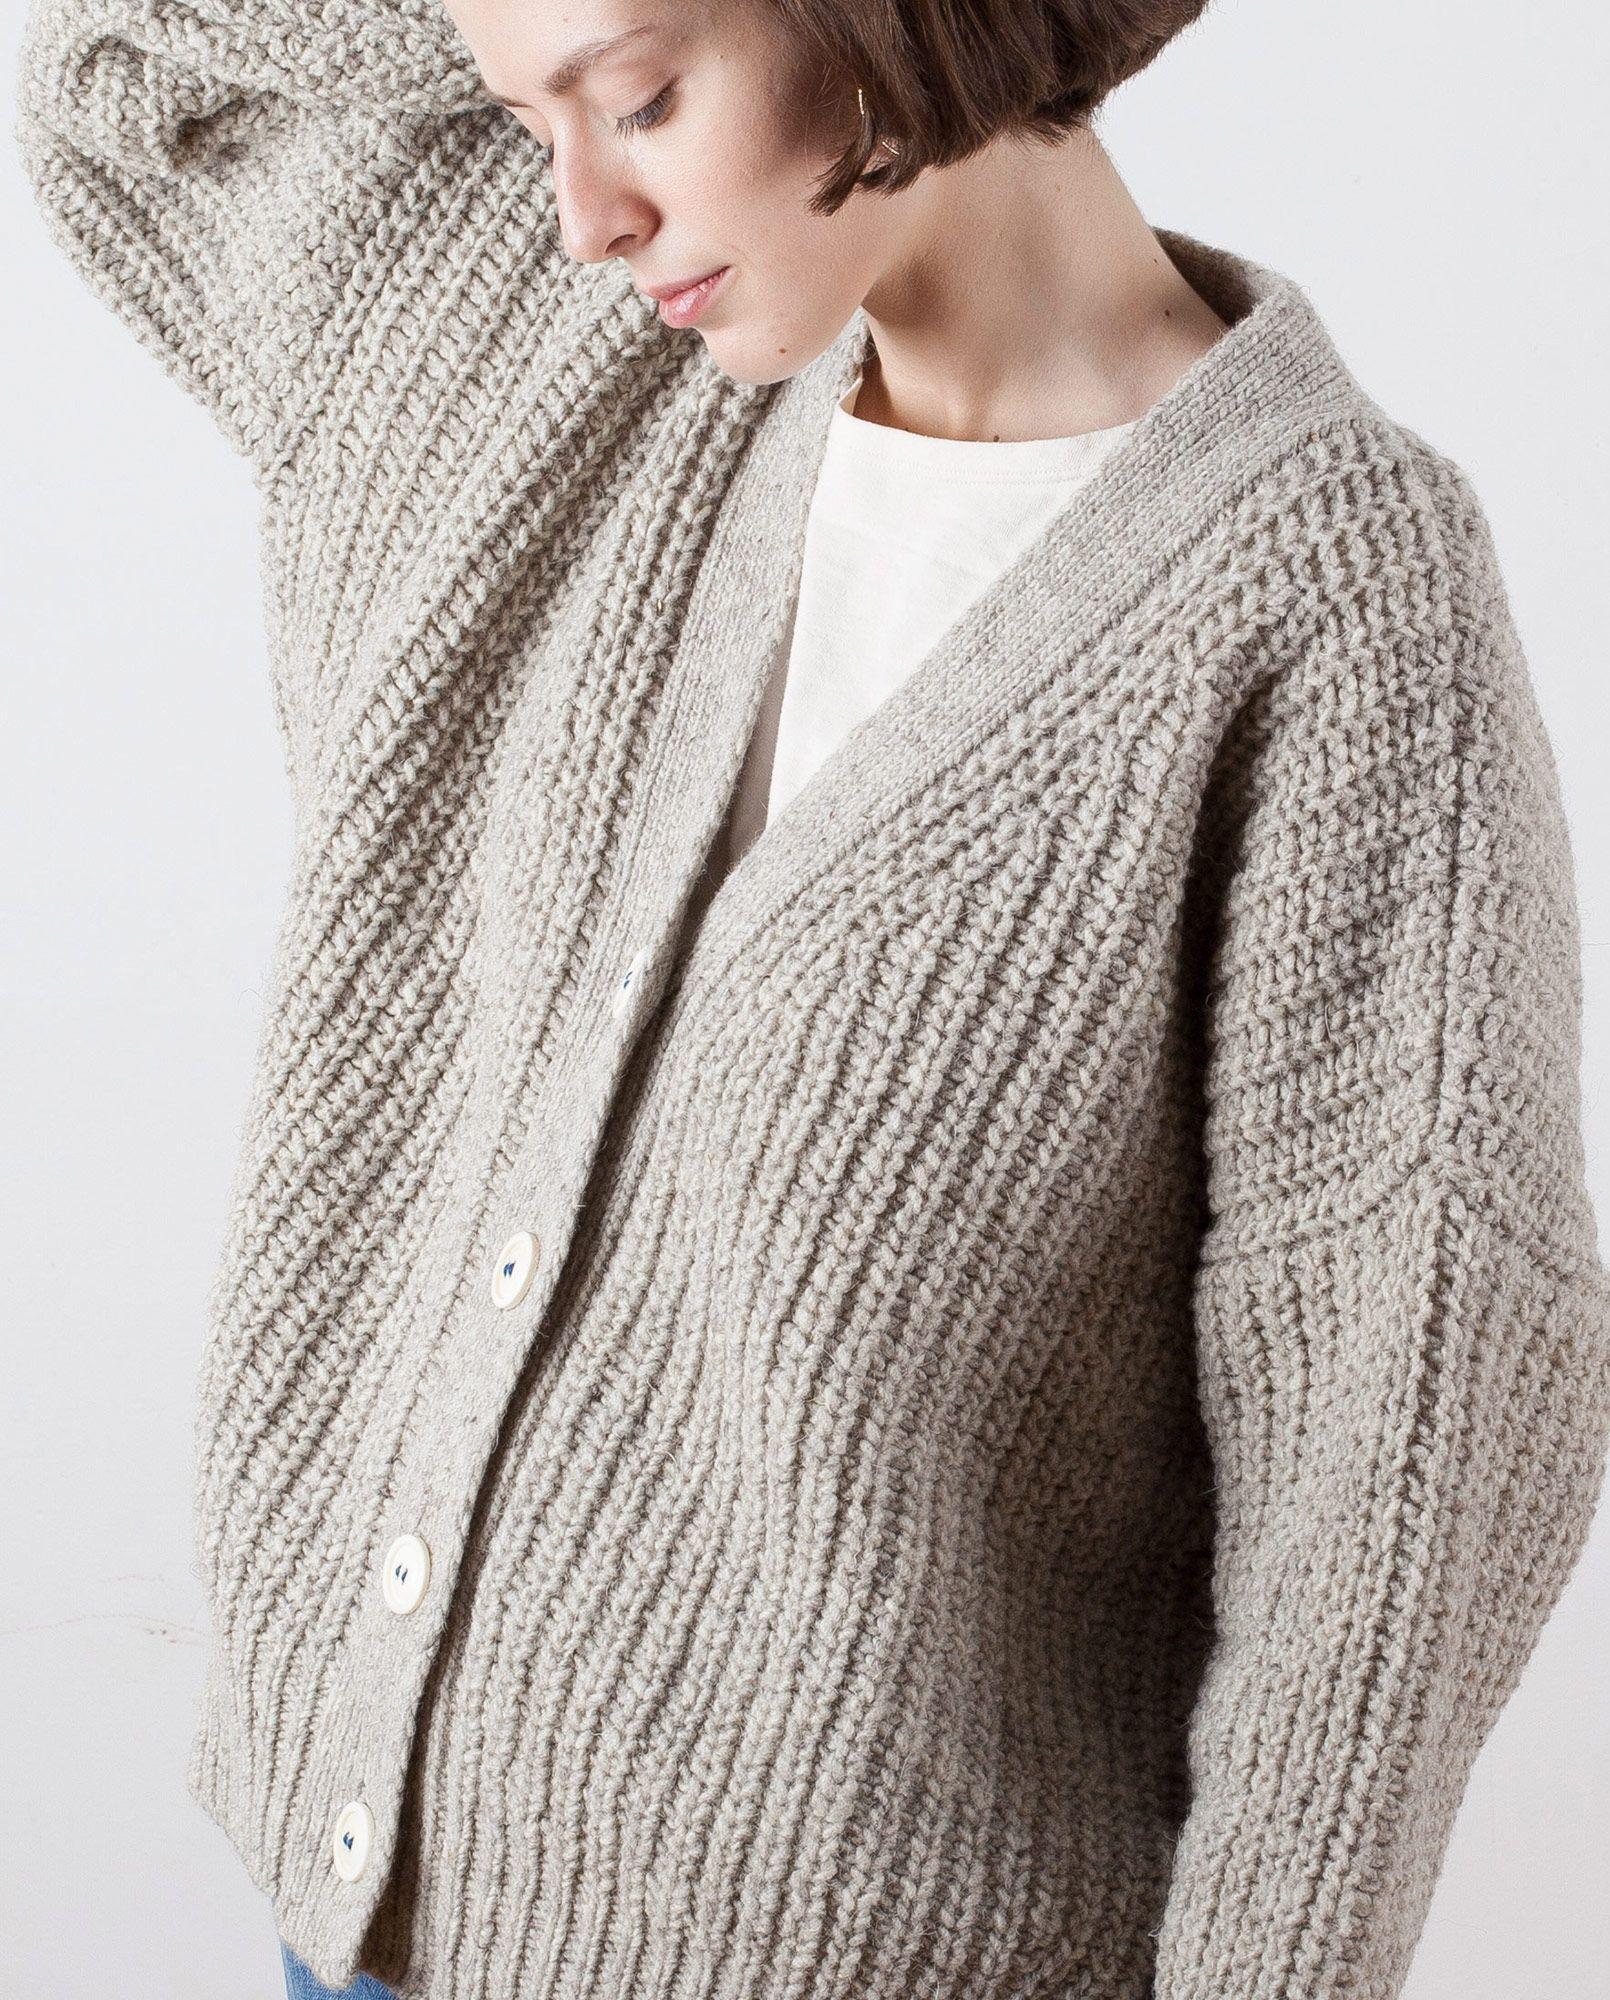 cardigan woman no19 mist | Fashion | Pinterest | Woman, Knitwear ...